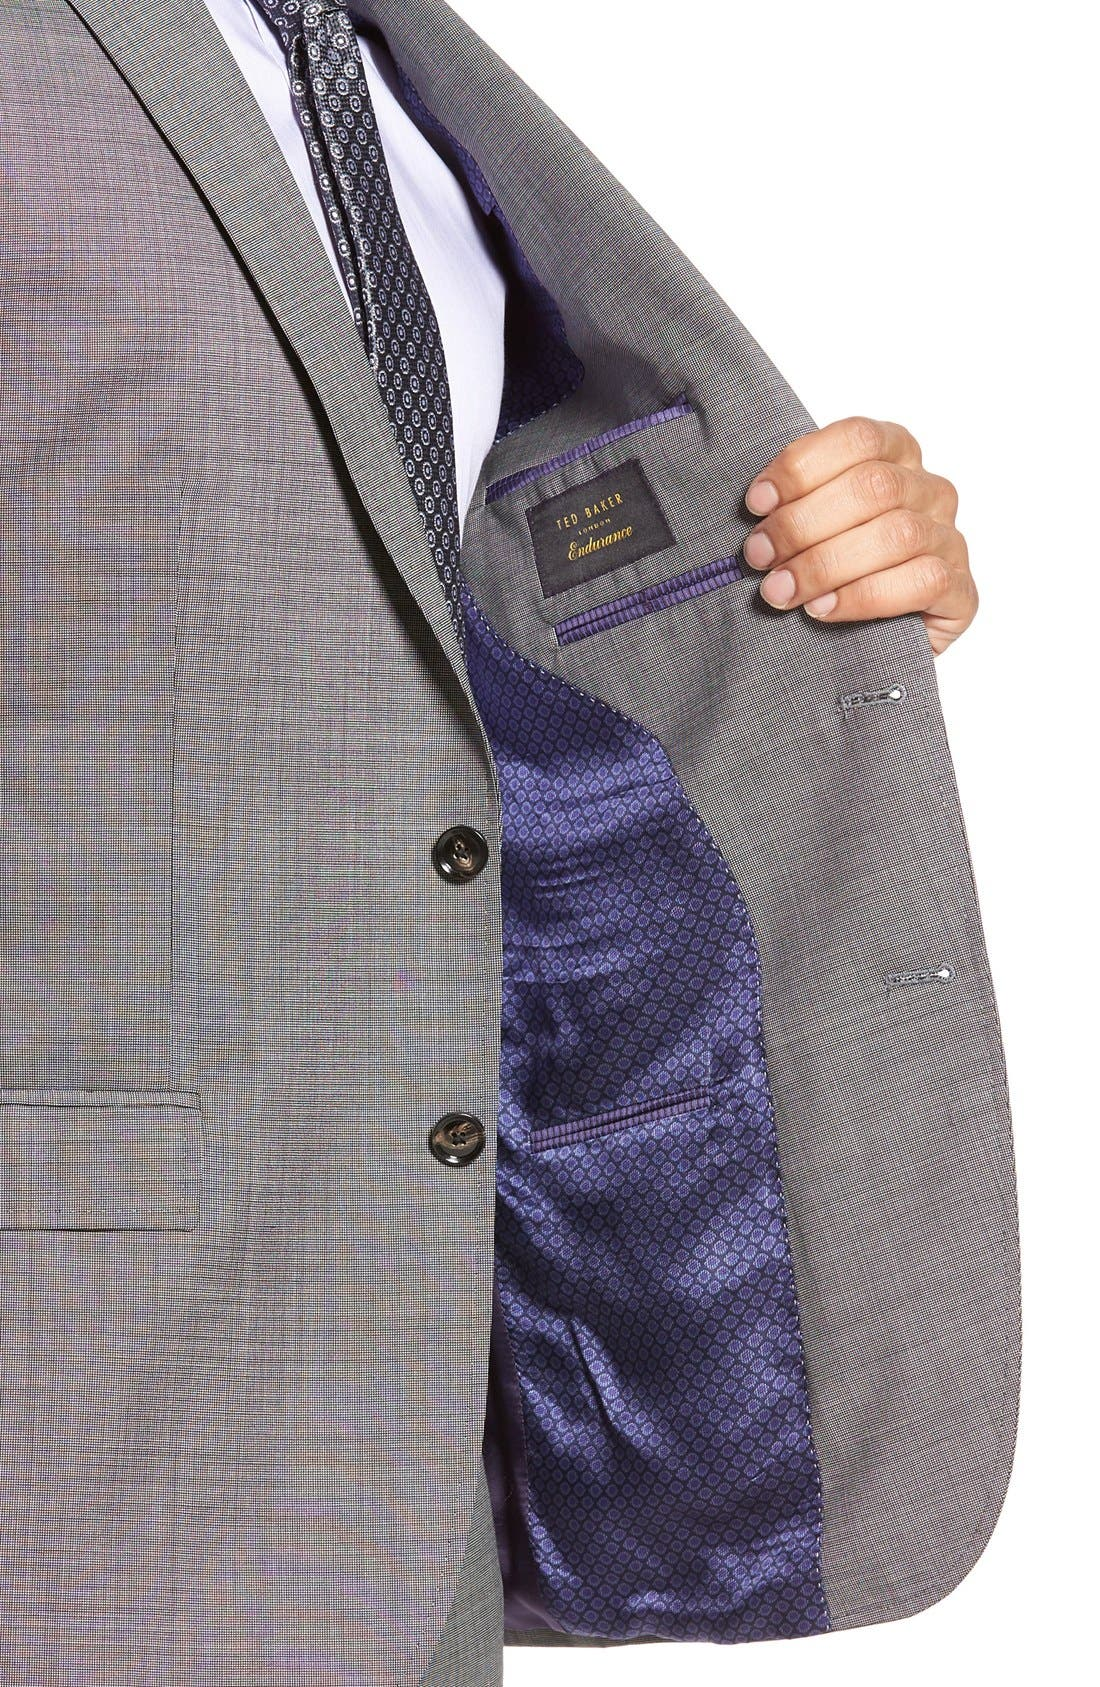 Jay Trim Fit Solid Wool Suit,                             Alternate thumbnail 16, color,                             LIGHT GREY